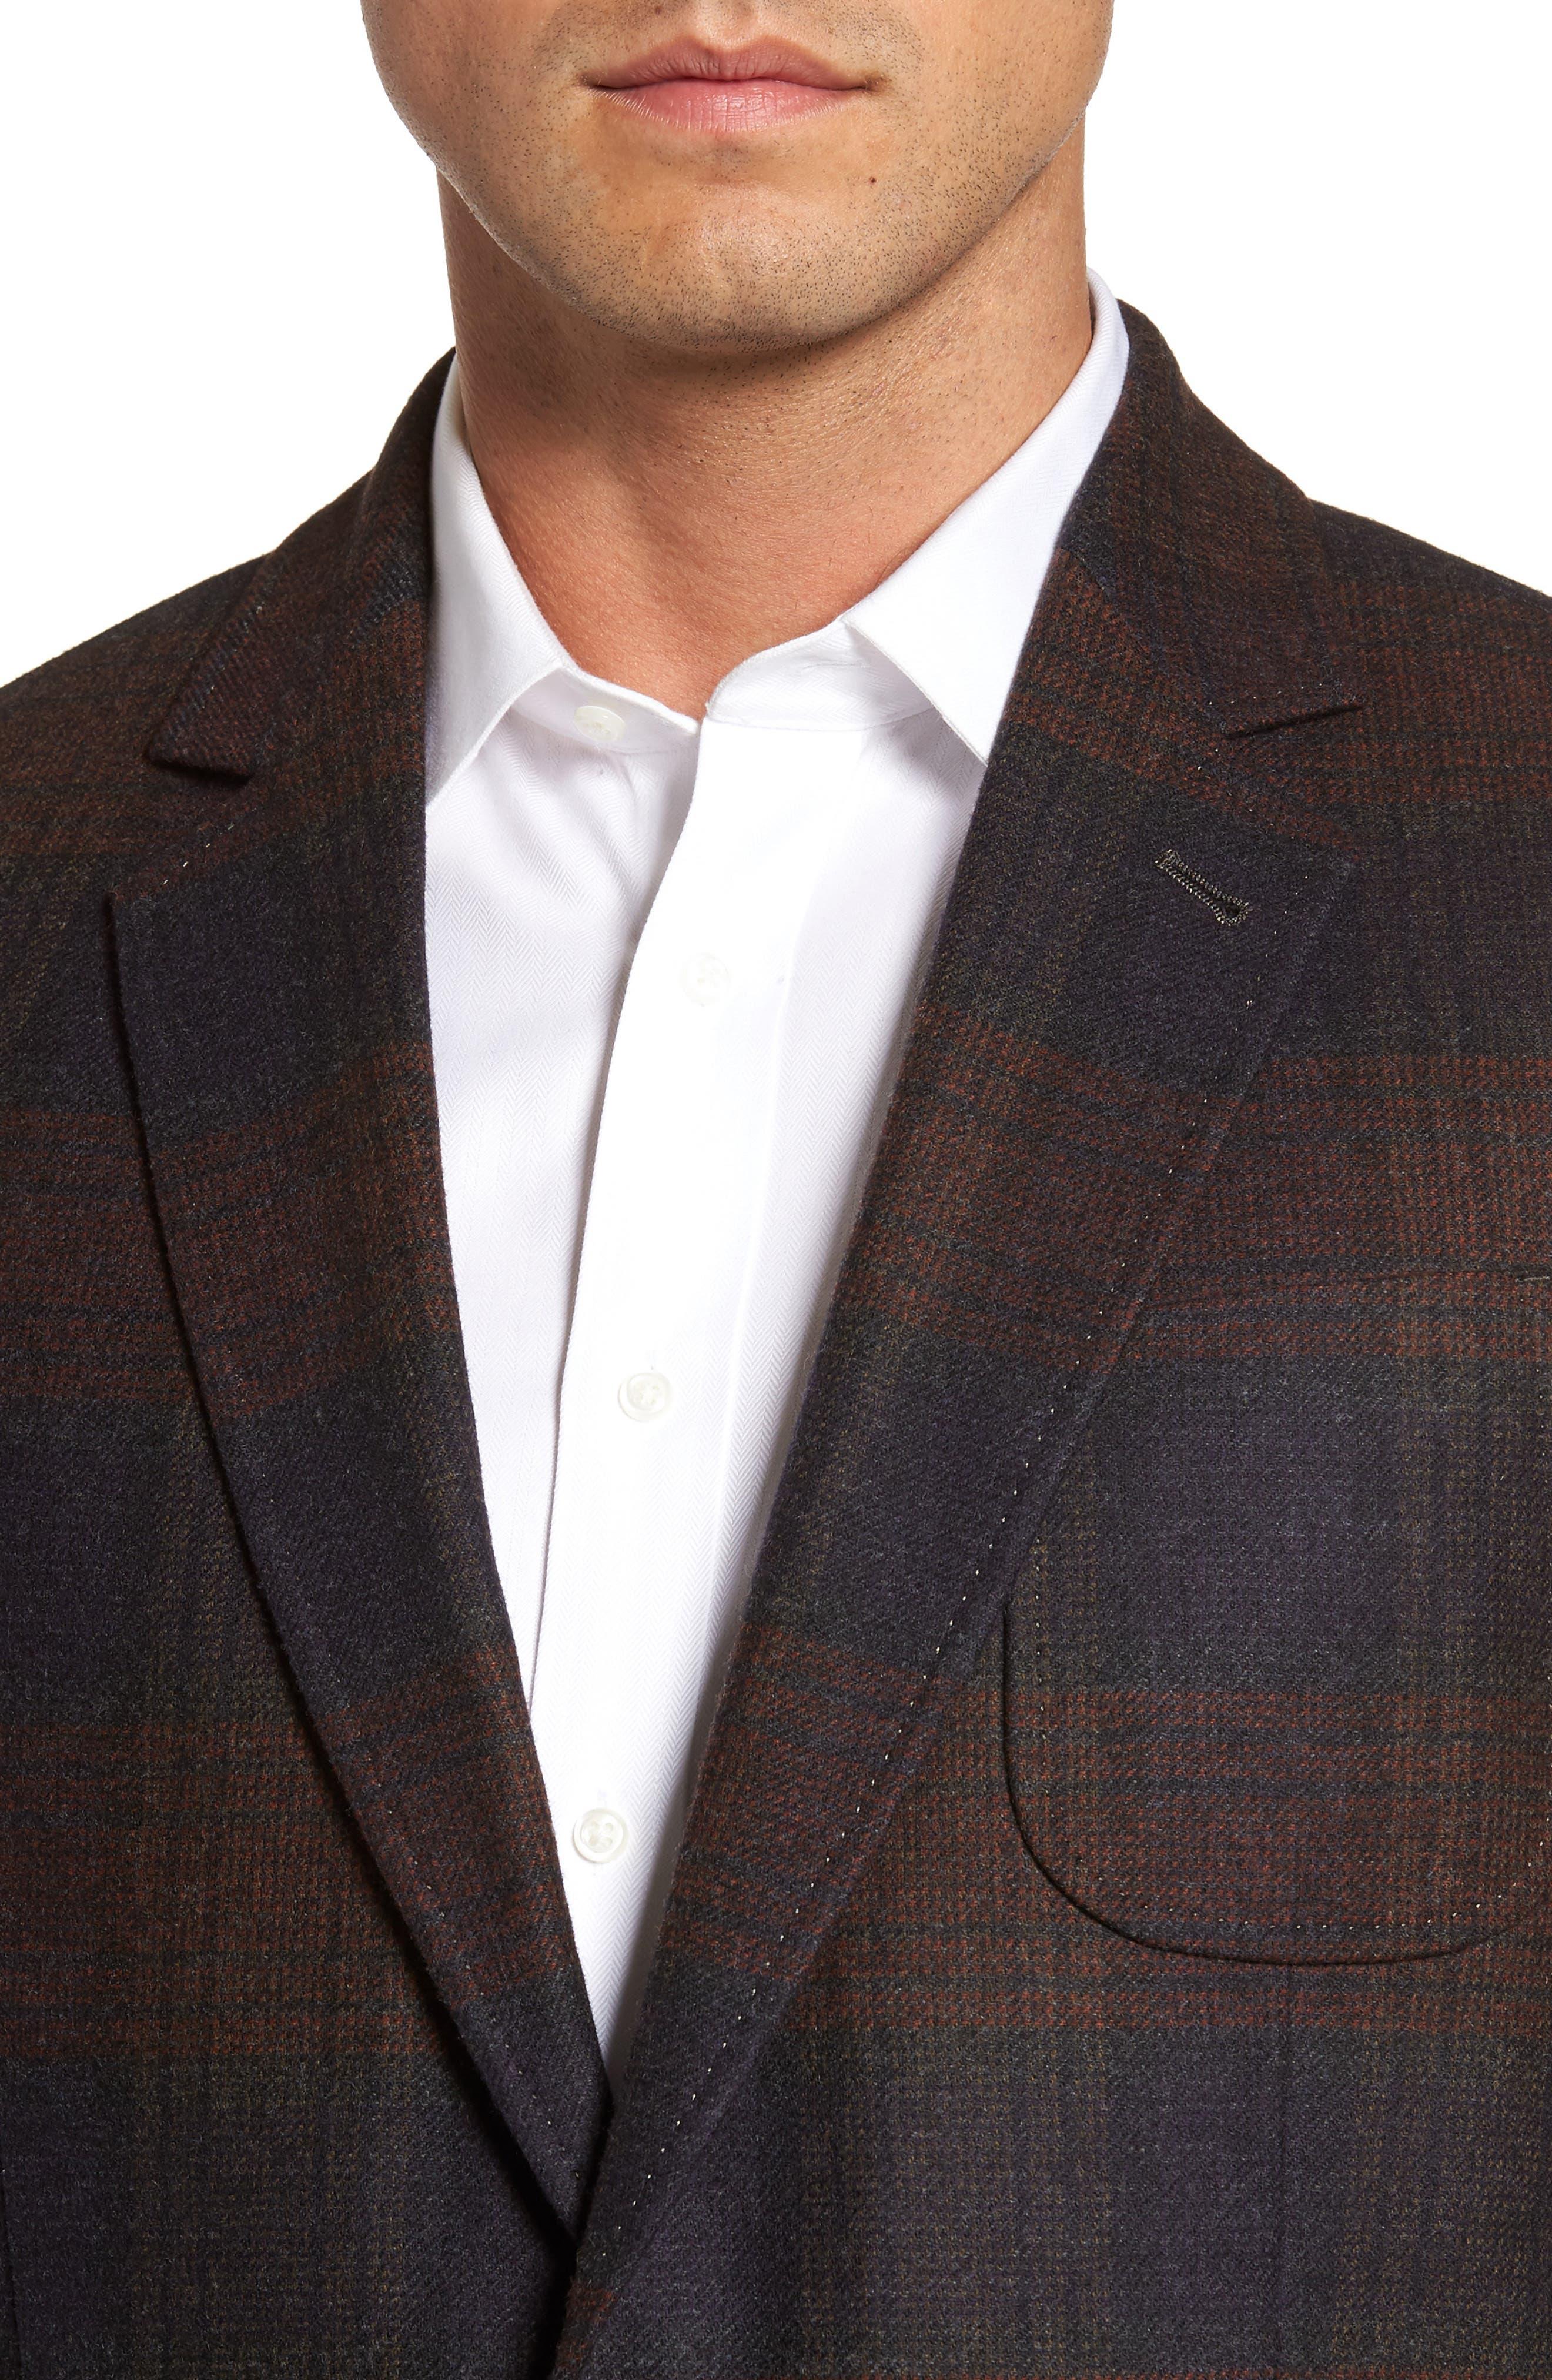 Plaid Wool Sport Coat,                             Alternate thumbnail 4, color,                             Charcoal